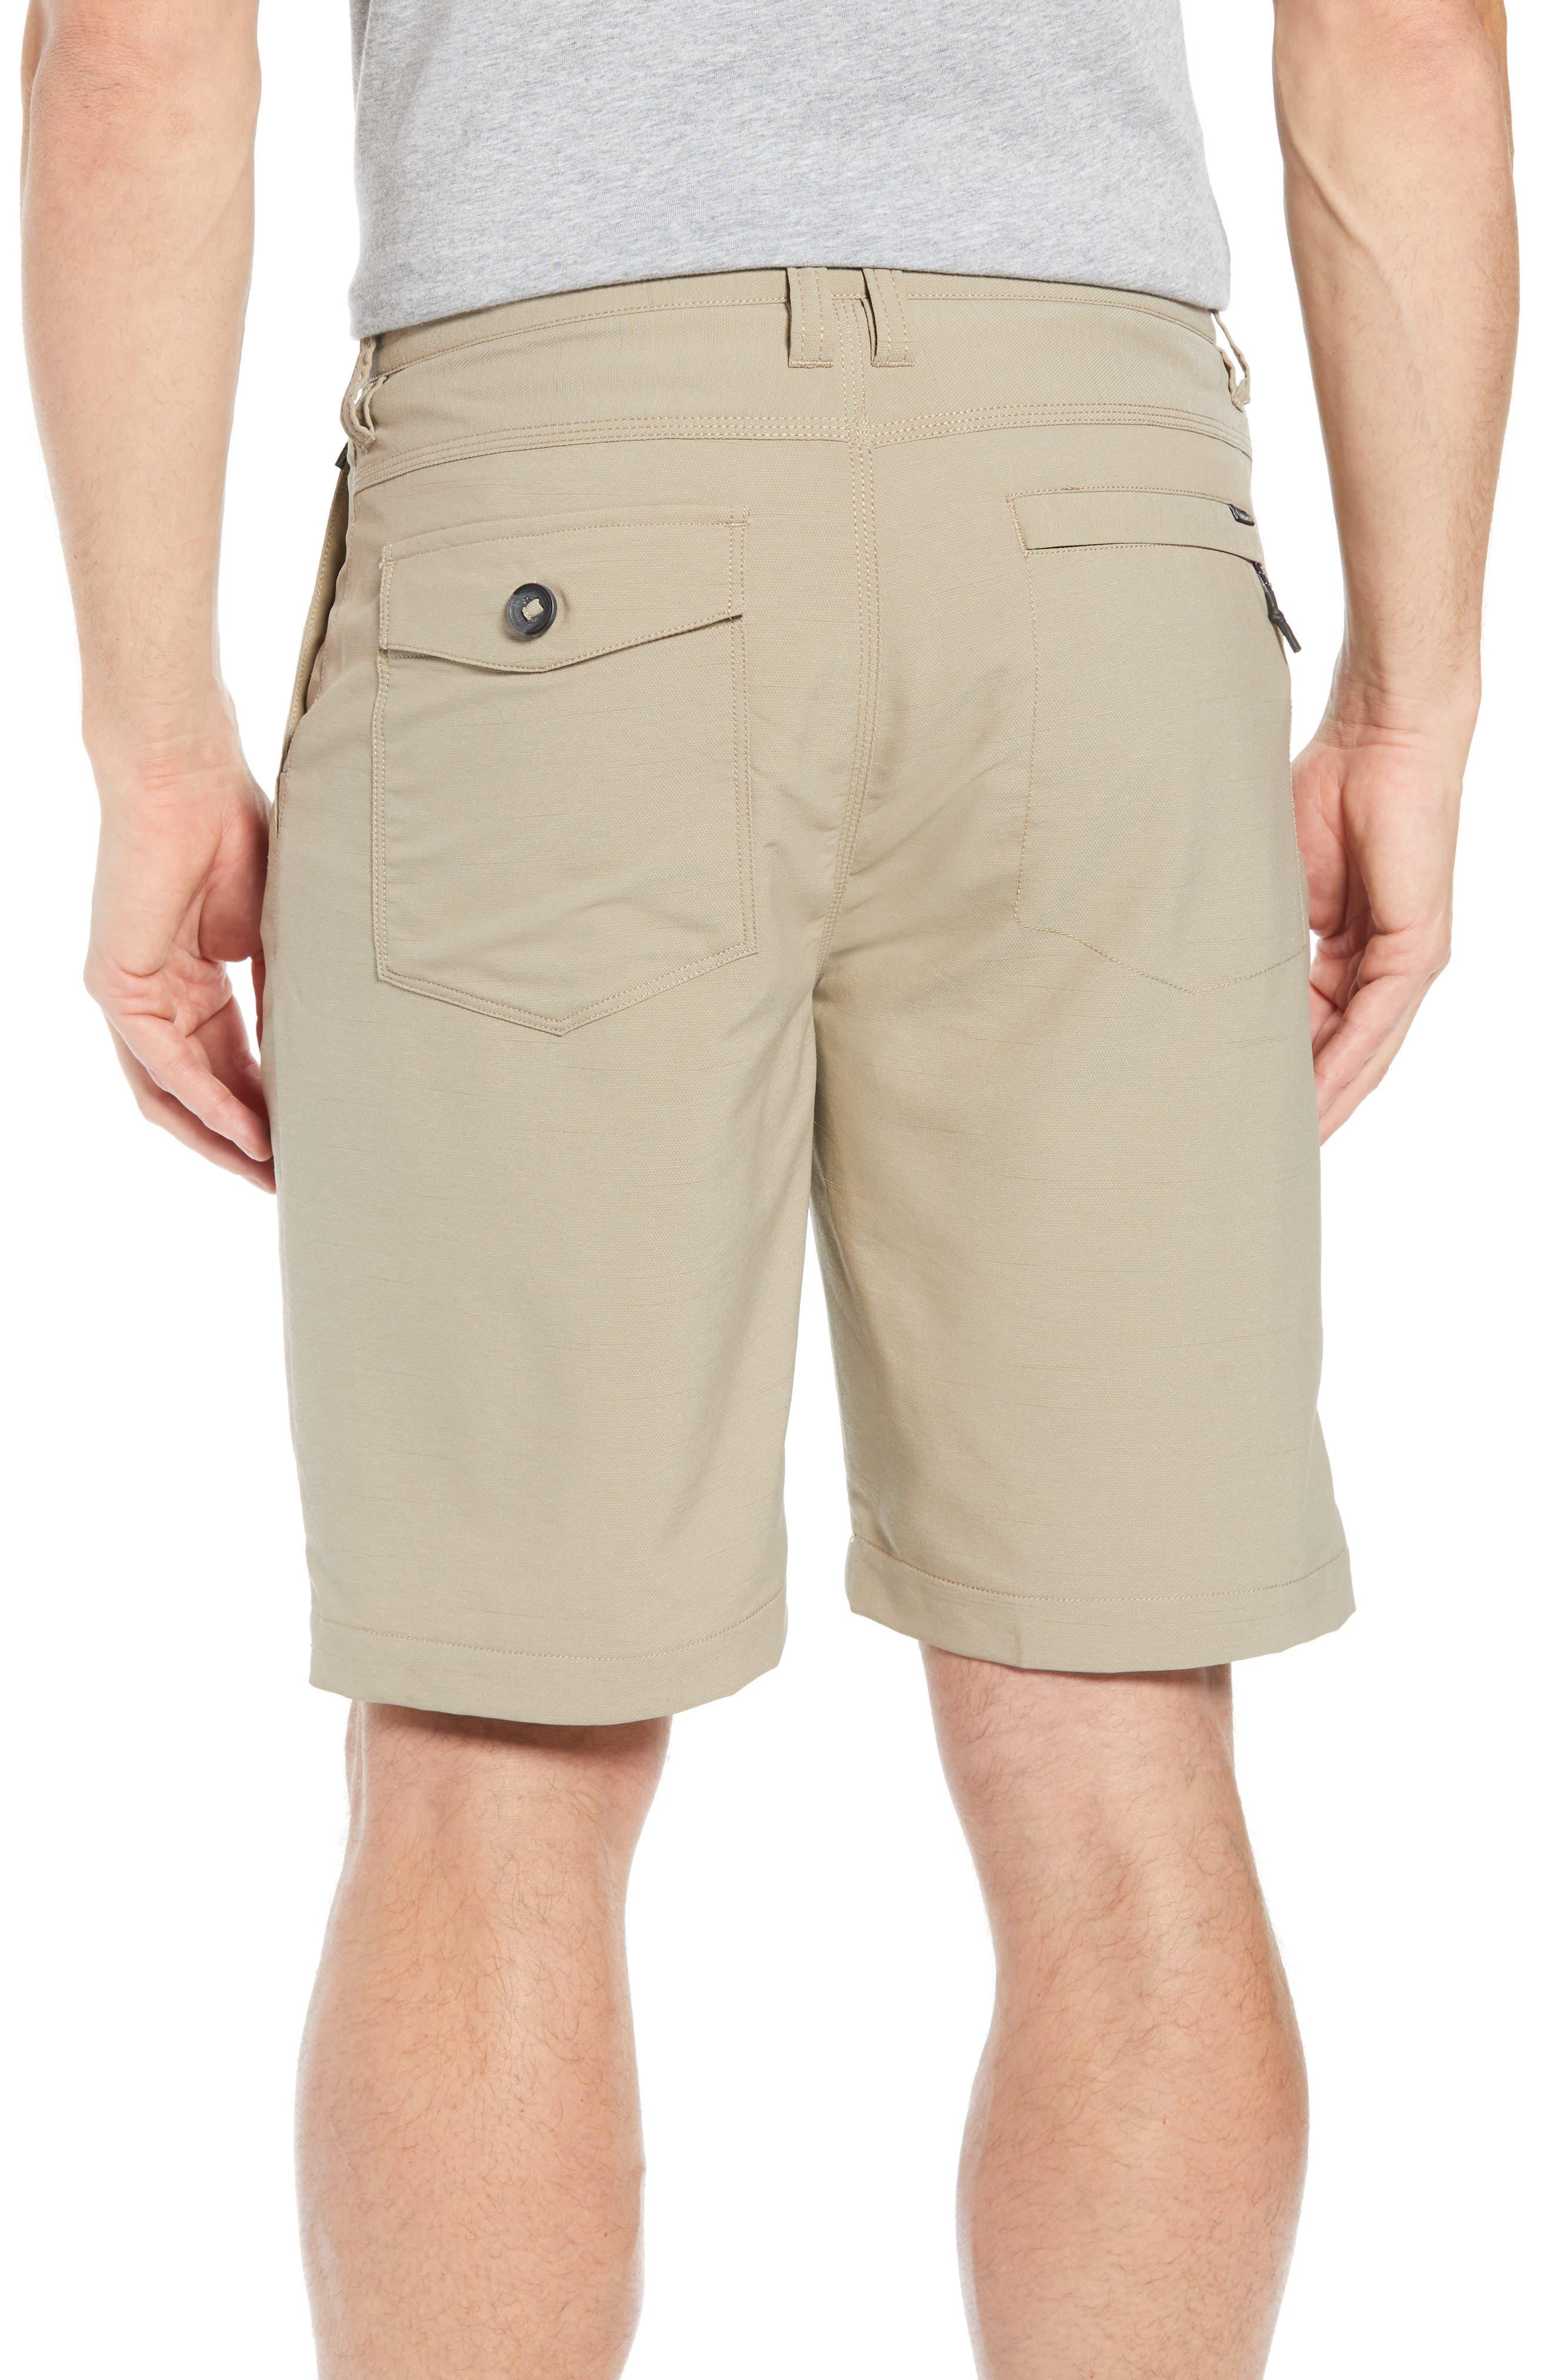 Surfreak Hybrid Shorts,                             Alternate thumbnail 2, color,                             KHAKI